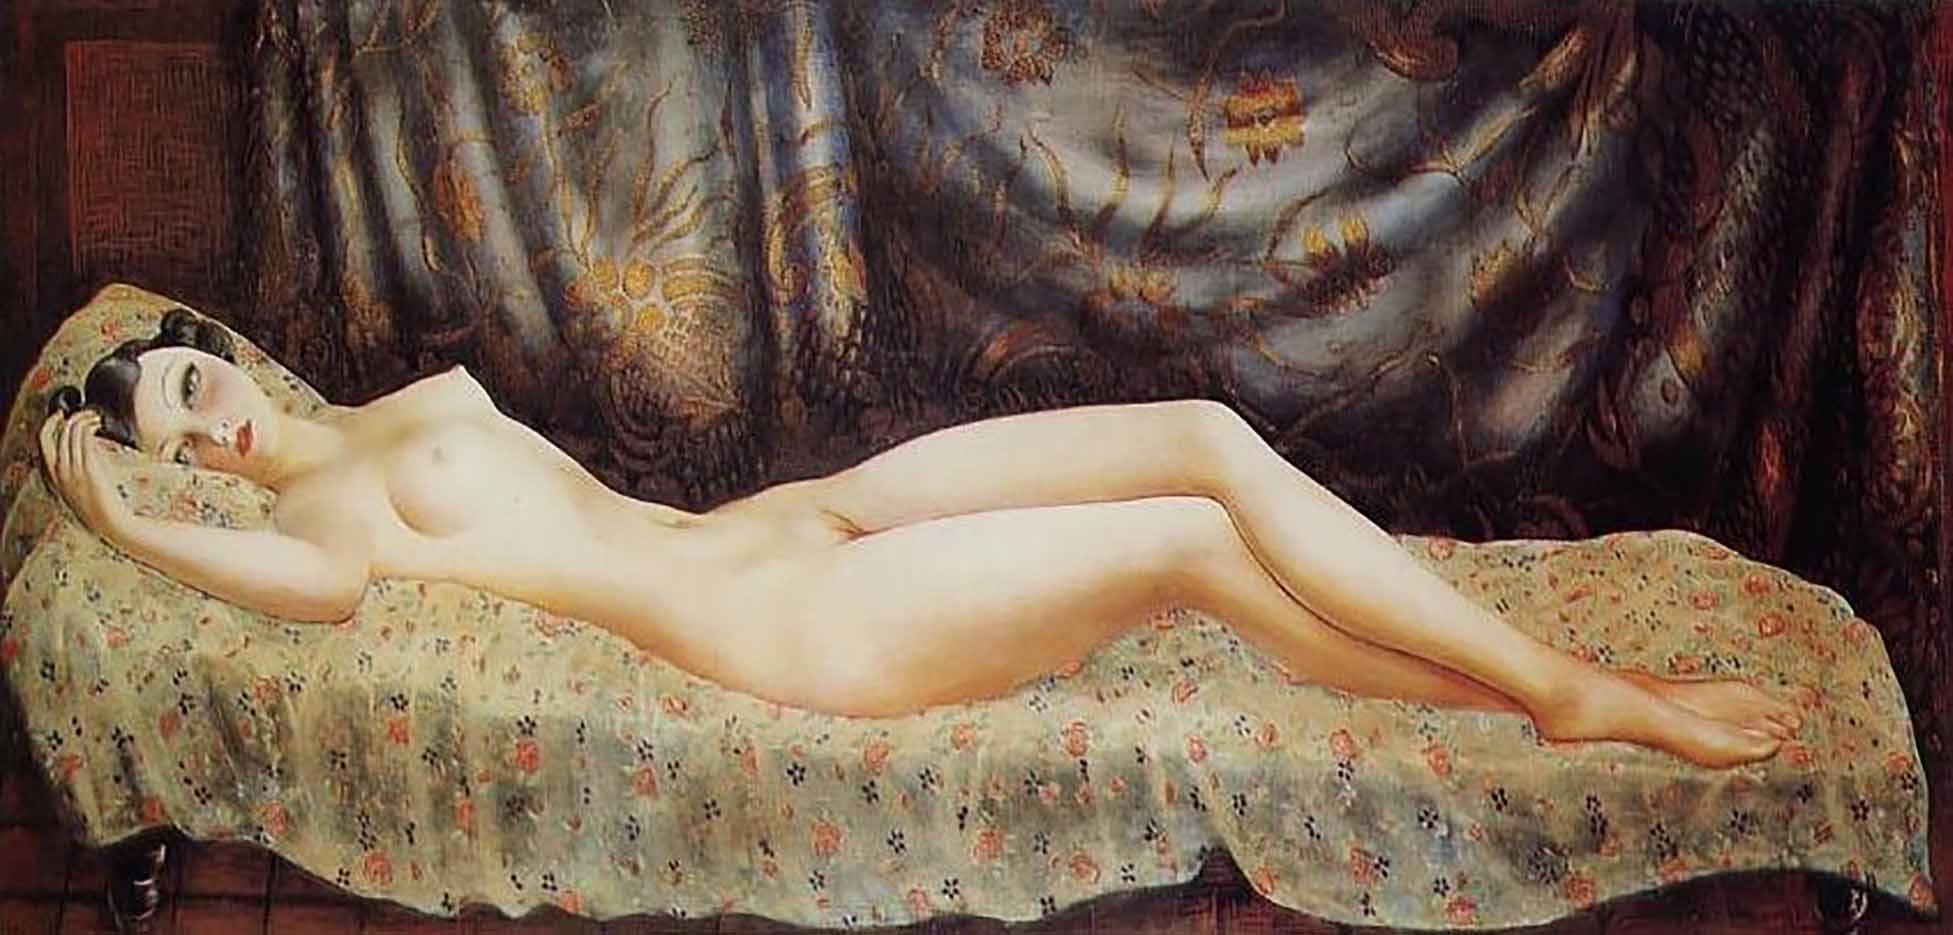 "Моисей Кислинг (Moise Kisling) ""Обнаженная. Потрет Арлетт | Nude portrait of Arletty"""